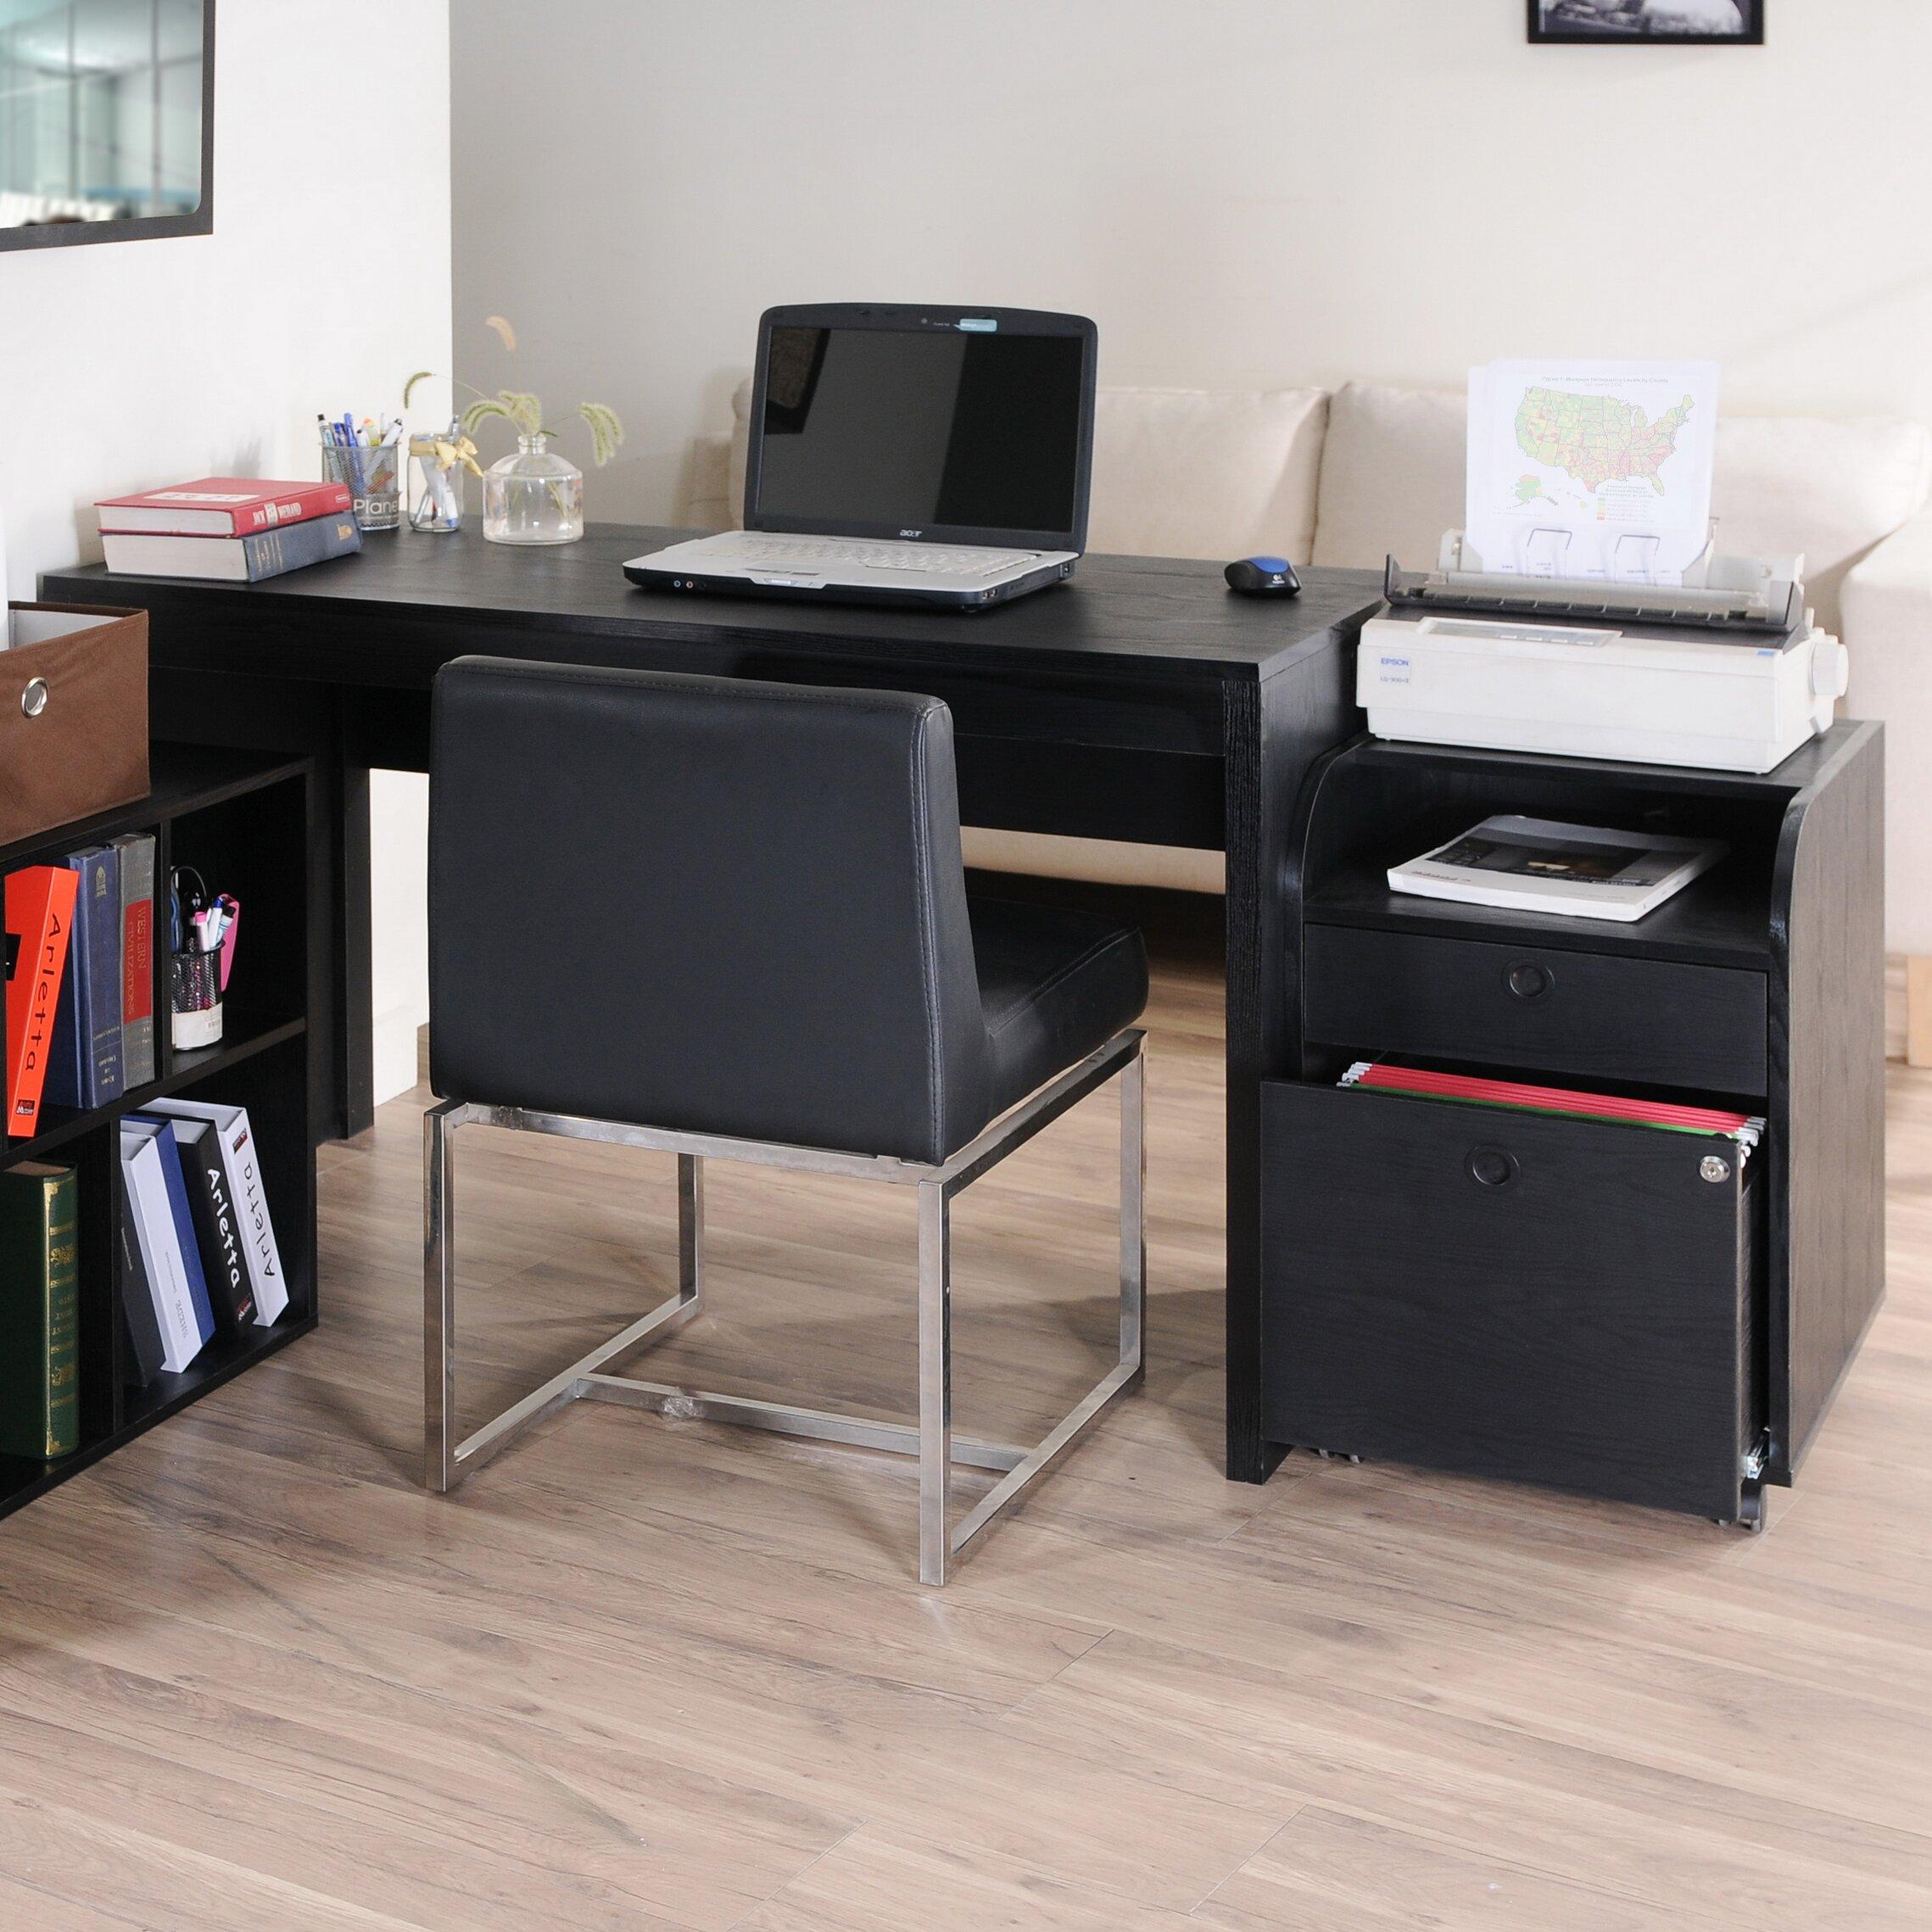 Zipcode™ Design Naomi 2 Piece Modular Computer Desk With. Backless Desk Chair. Short Console Table. Apple Computer Help Desk. Table Lamp With Nightlight Base. Rental Tables. Desk Decor. Diy Vintage Desk. Engraved Desk Set